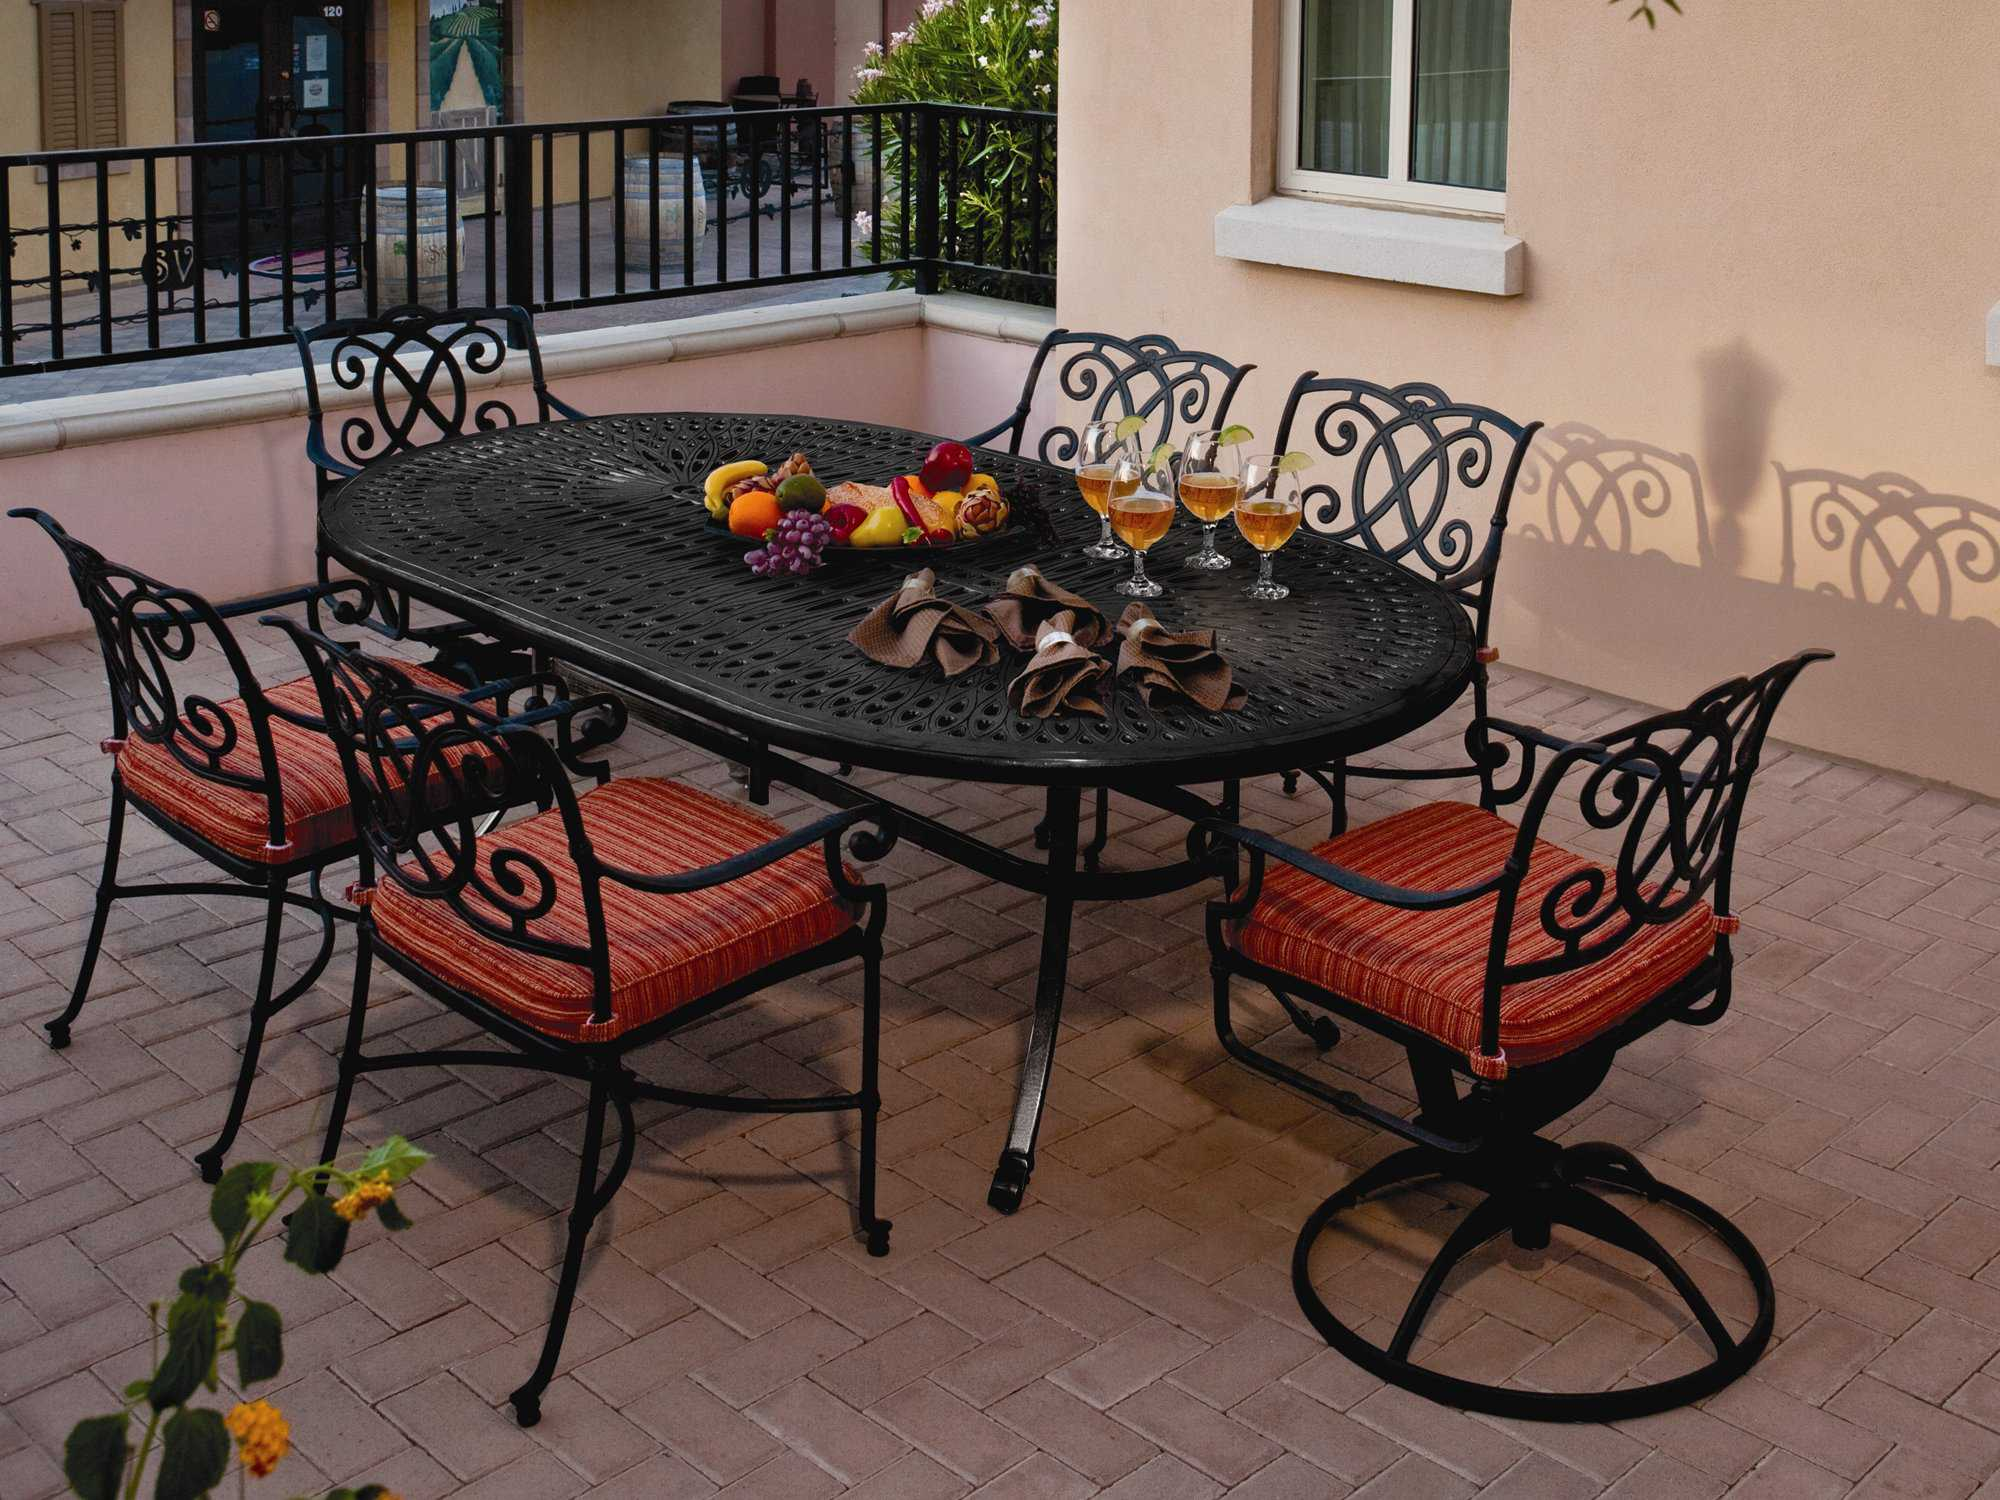 Winston patio furniture prices patiofurniturebuy winston for Winston outdoor furniture